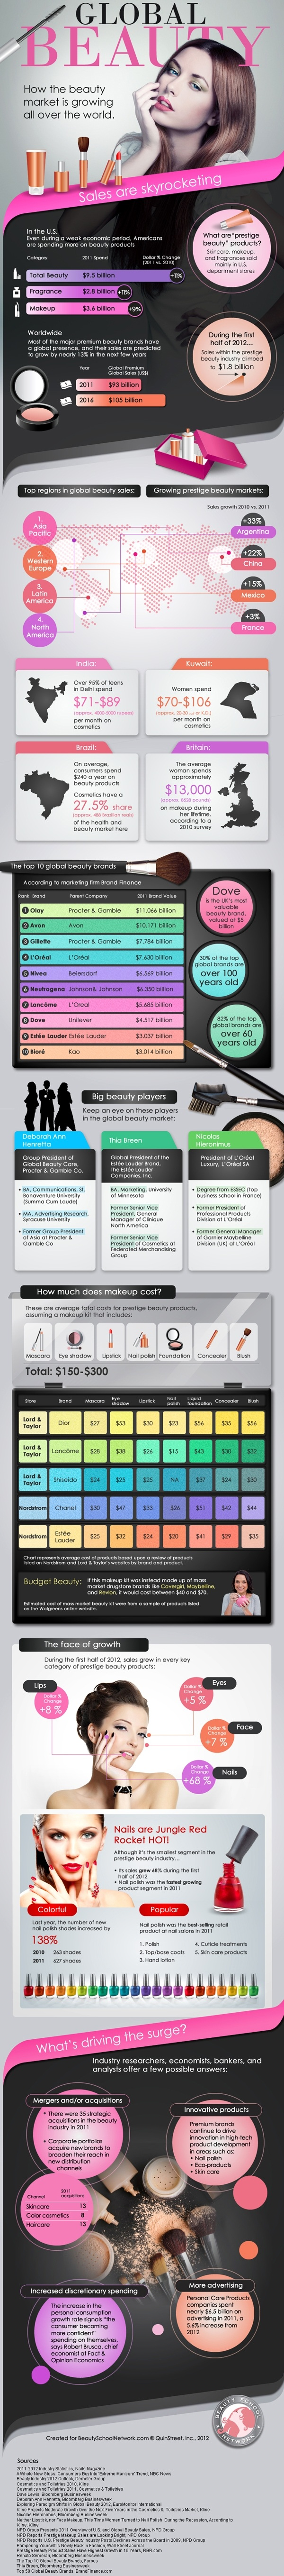 Global Beauty Market Statistics